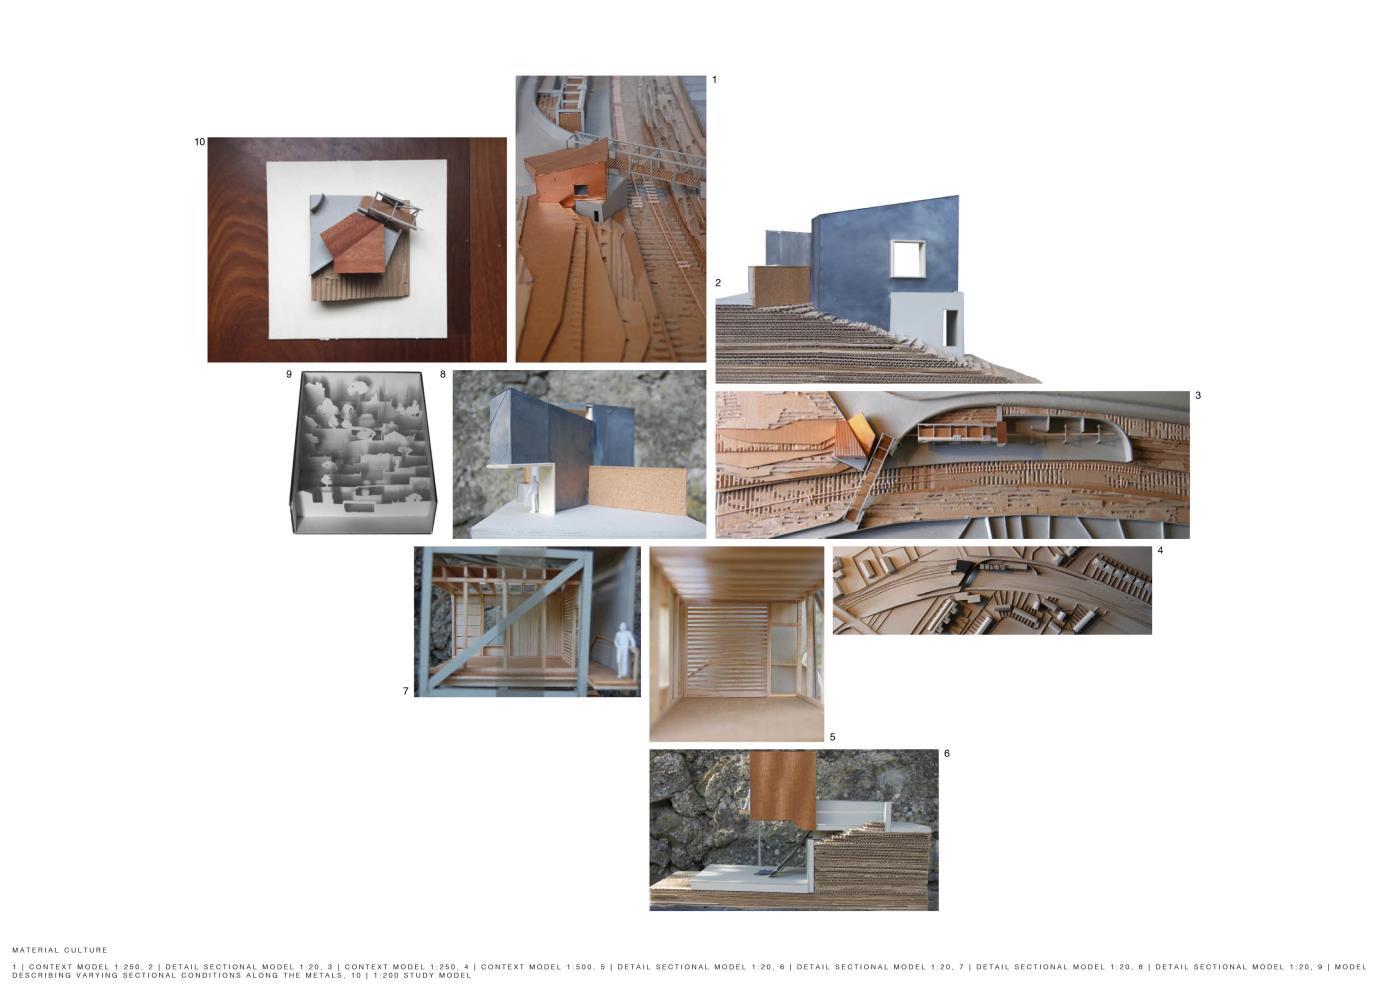 Adaptive Landscape – Material Culture – The Metals Scrapyard